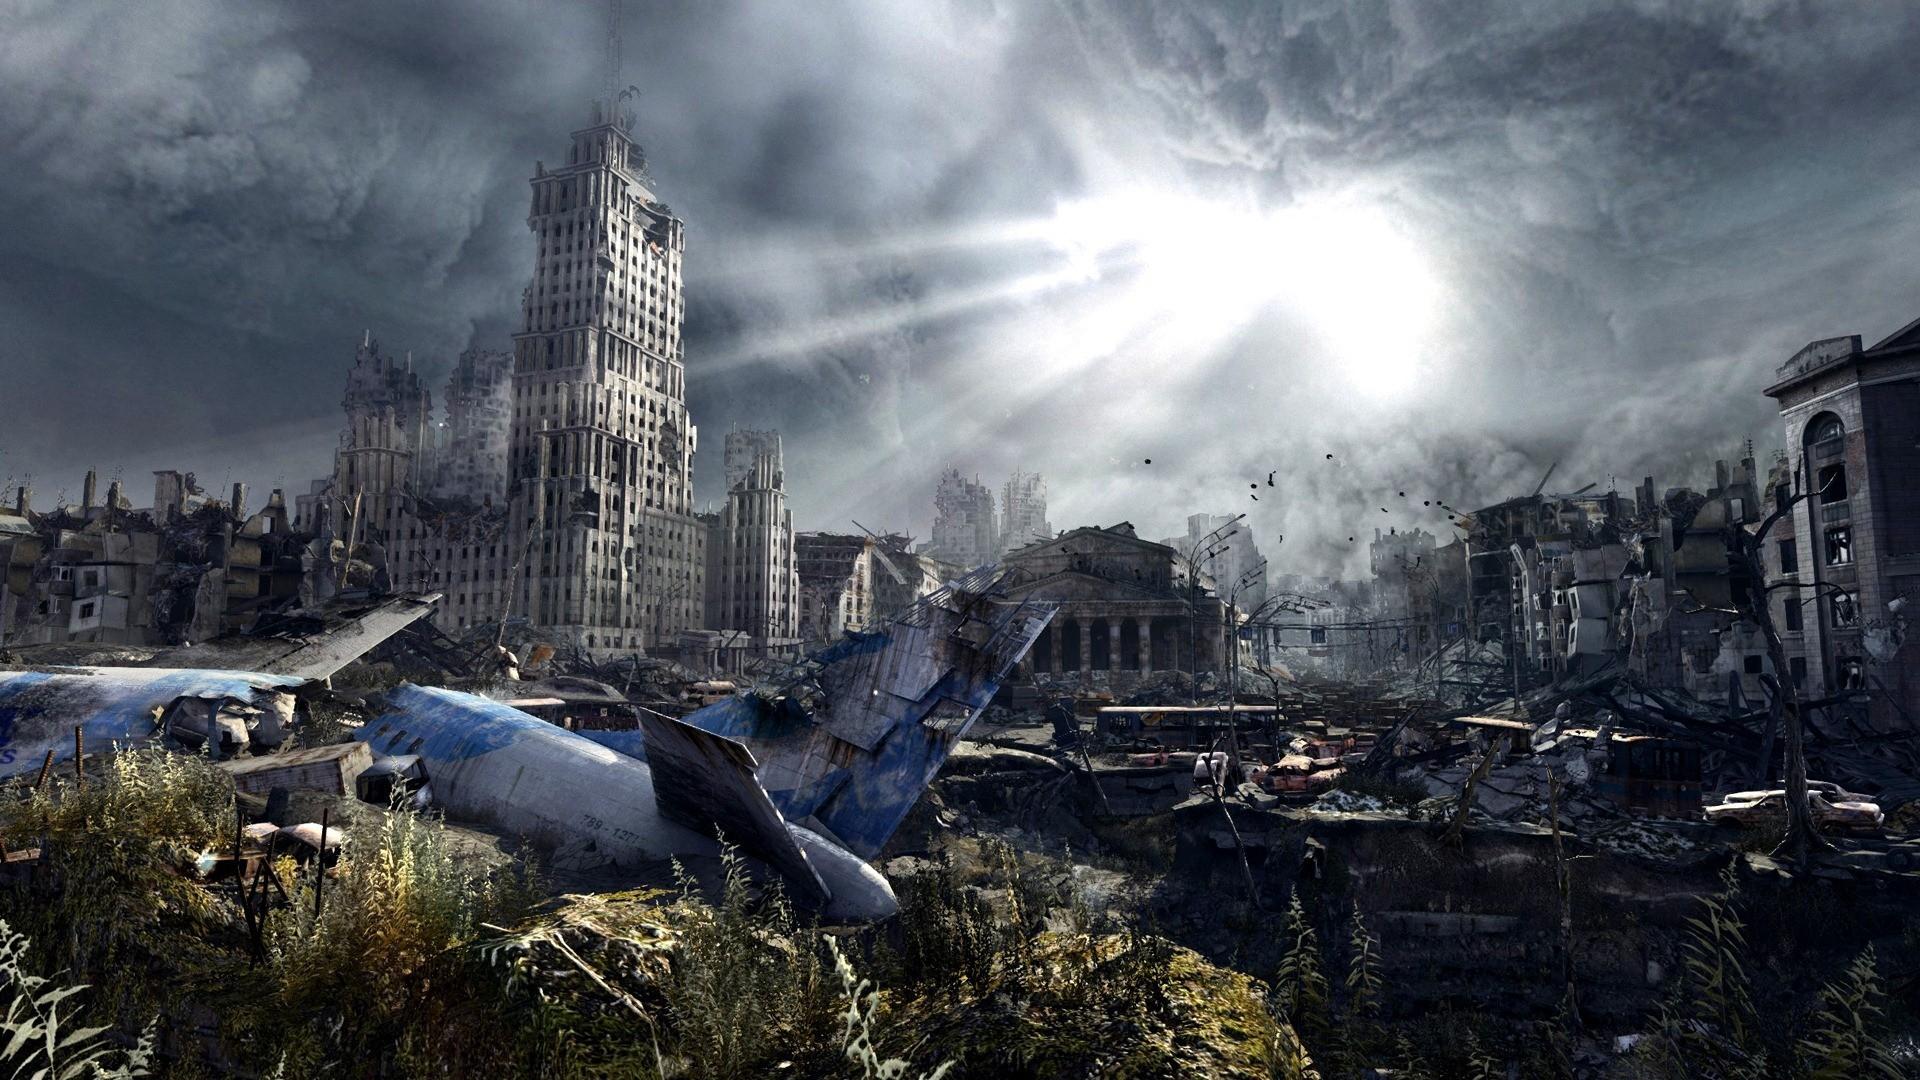 Post apocalyptic cities plane crash state university wallpaper